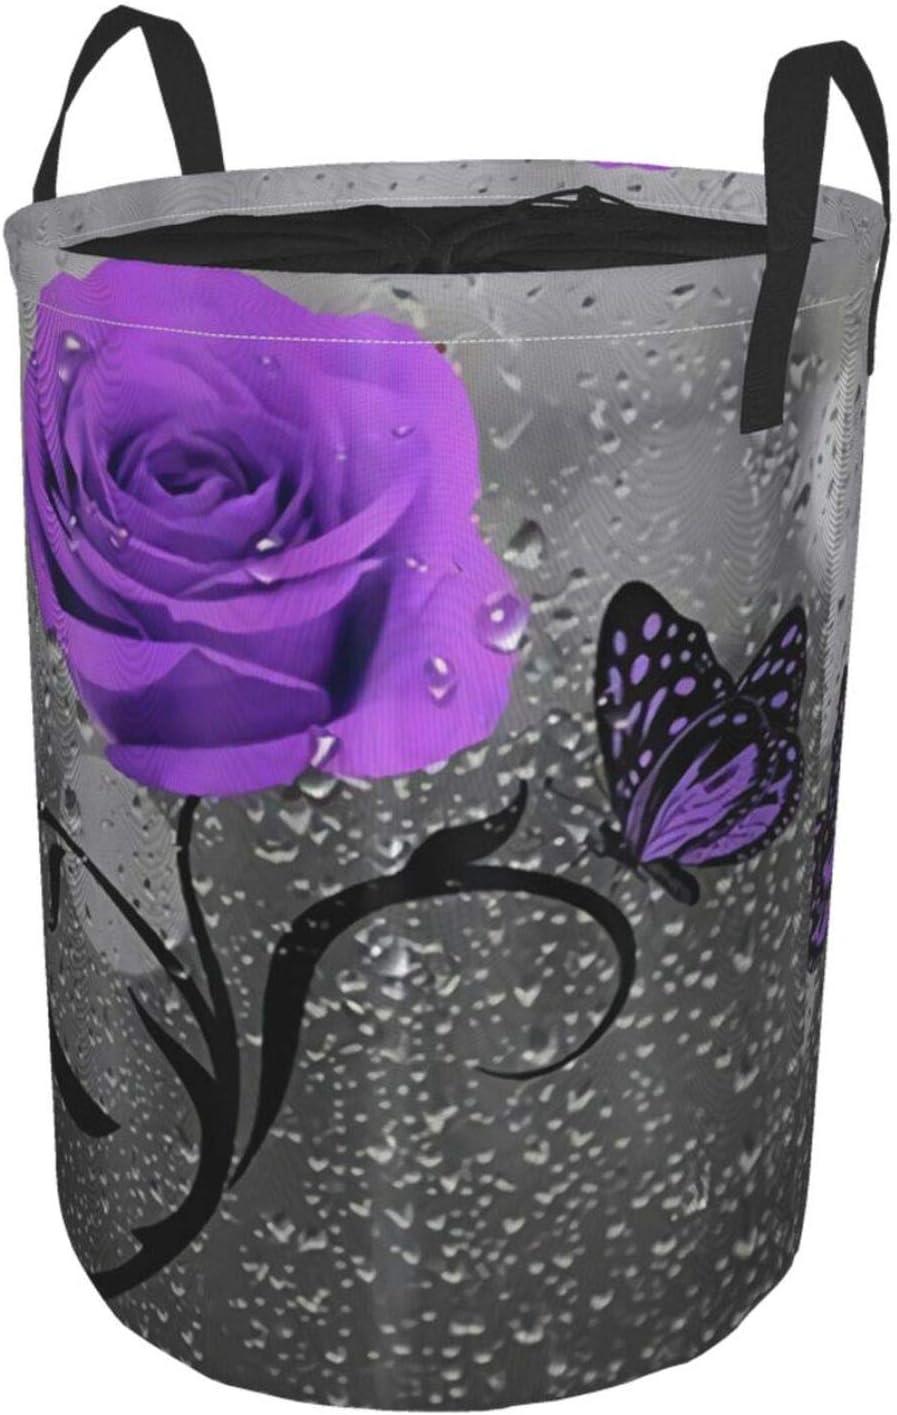 YMBKFan Large free shipping Storage Baskets Purple Discount is also underway Butterflies Flower Rose Gre